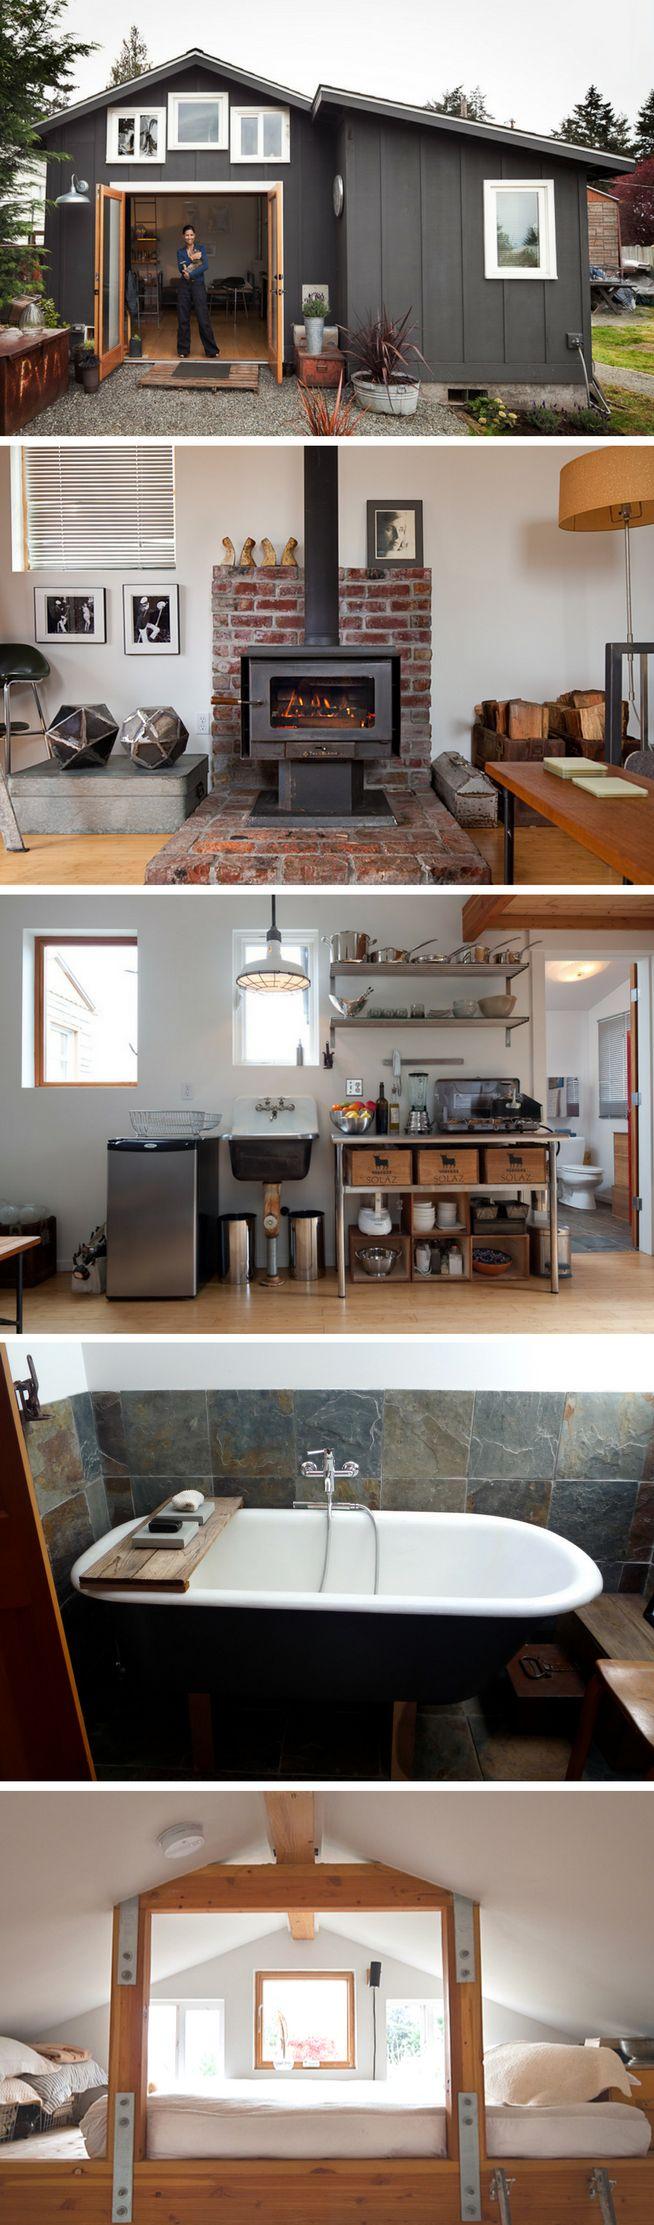 A former garage, transformed into a stunning modern home.